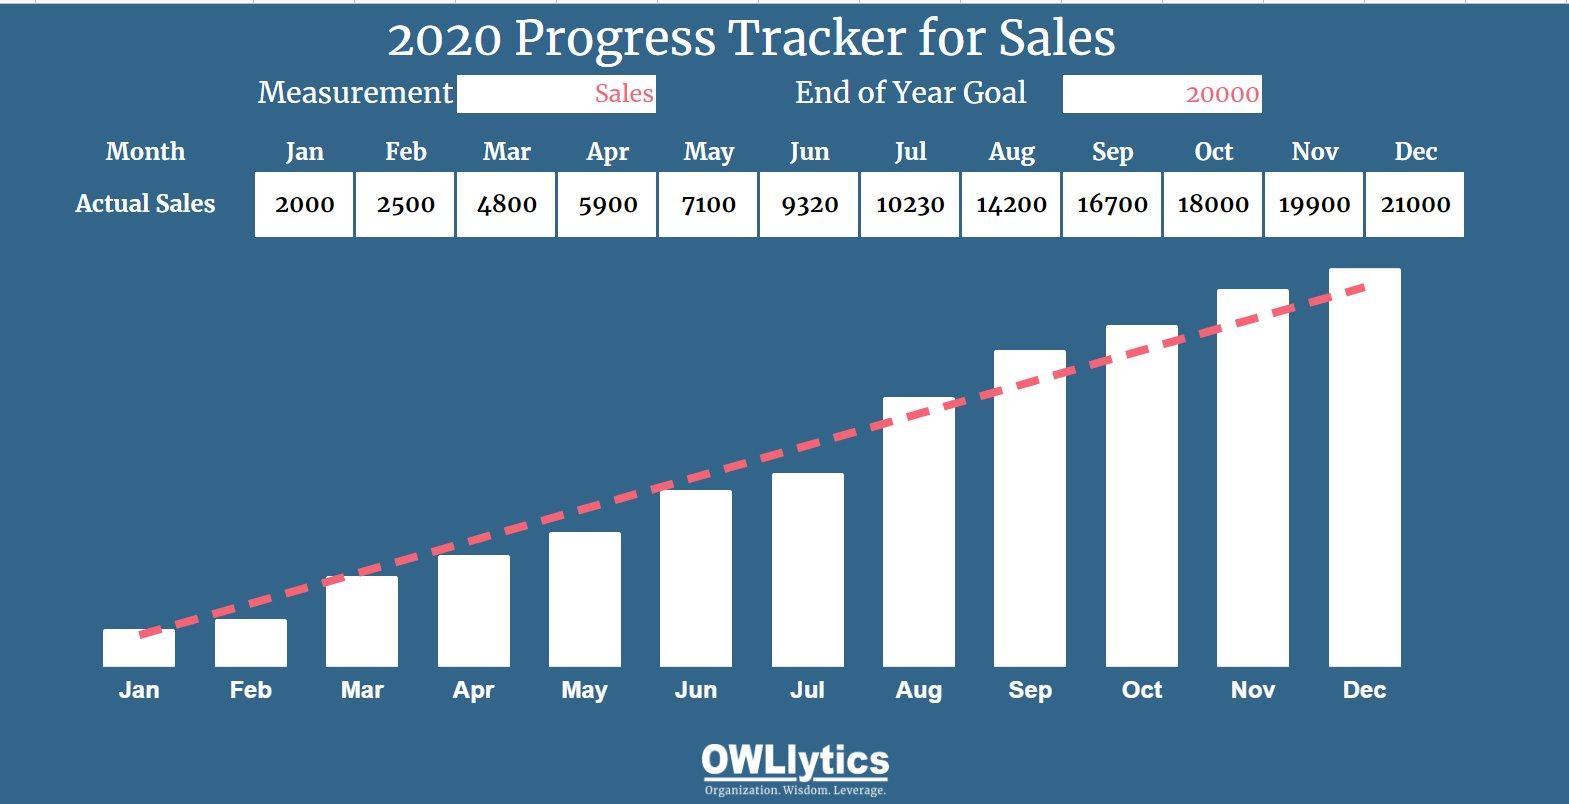 Screen shot of progress tracker chart owllytics